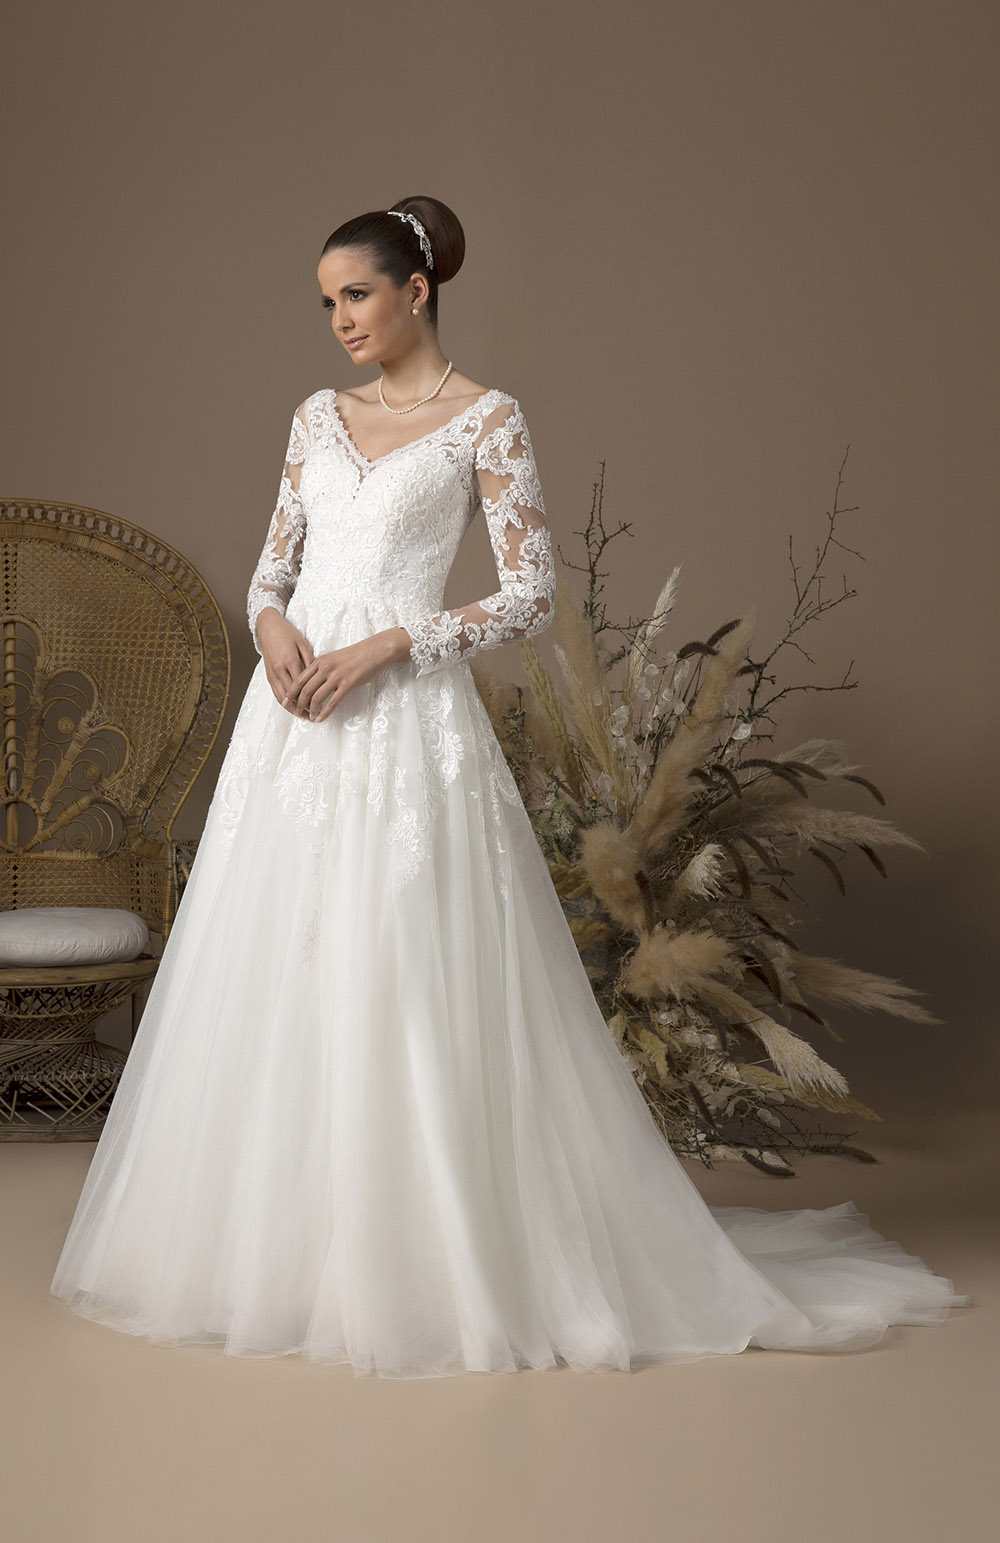 Robe de mariée Modèle Dalila